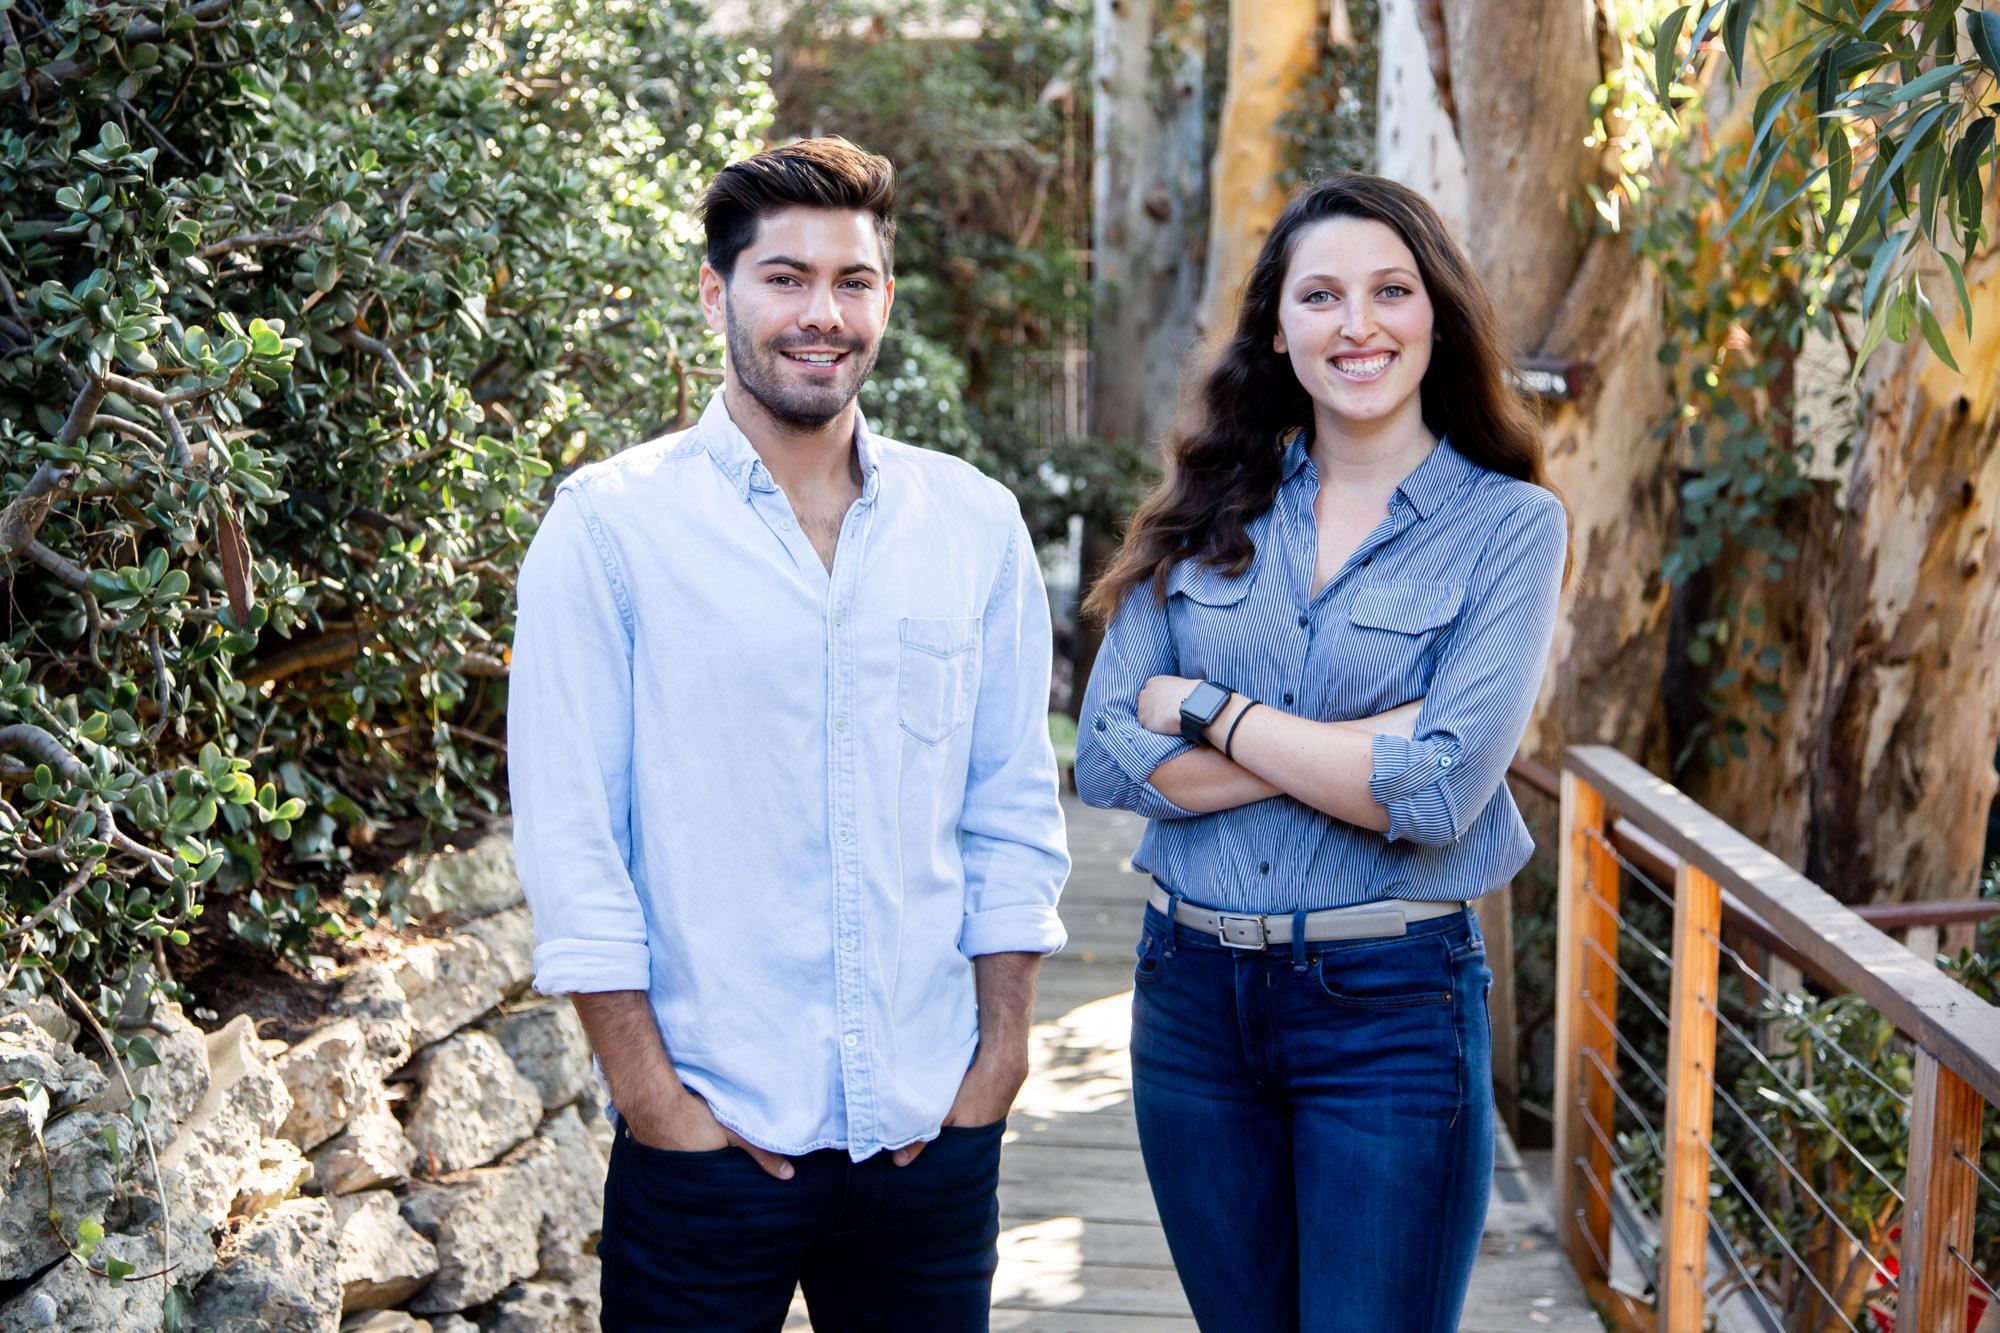 #BYOB: Meet Samantha Pantazopoulos & Dylan Barbour of Vizer App